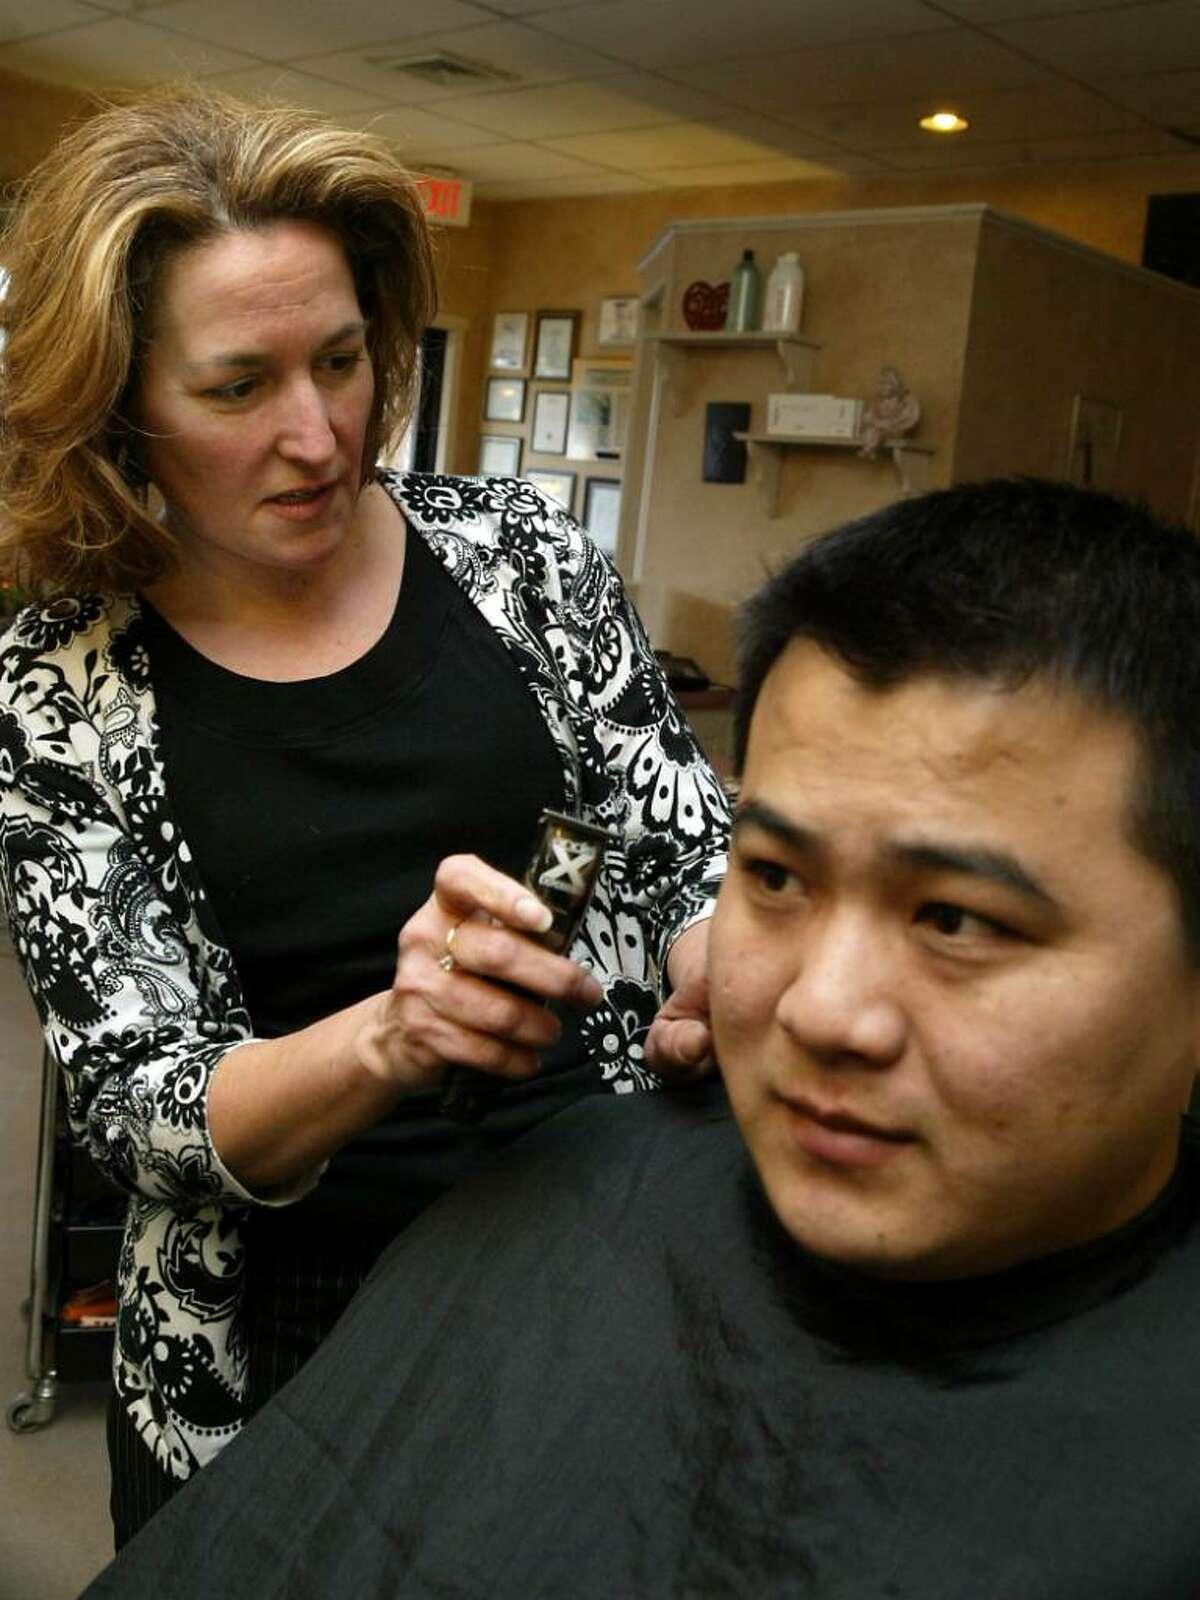 Nancy Aponte, of Salon Aponte on Main Street in Monroe, trims Tom Xia's hair in her salon. Wednesday, Jan. 27, 2010.